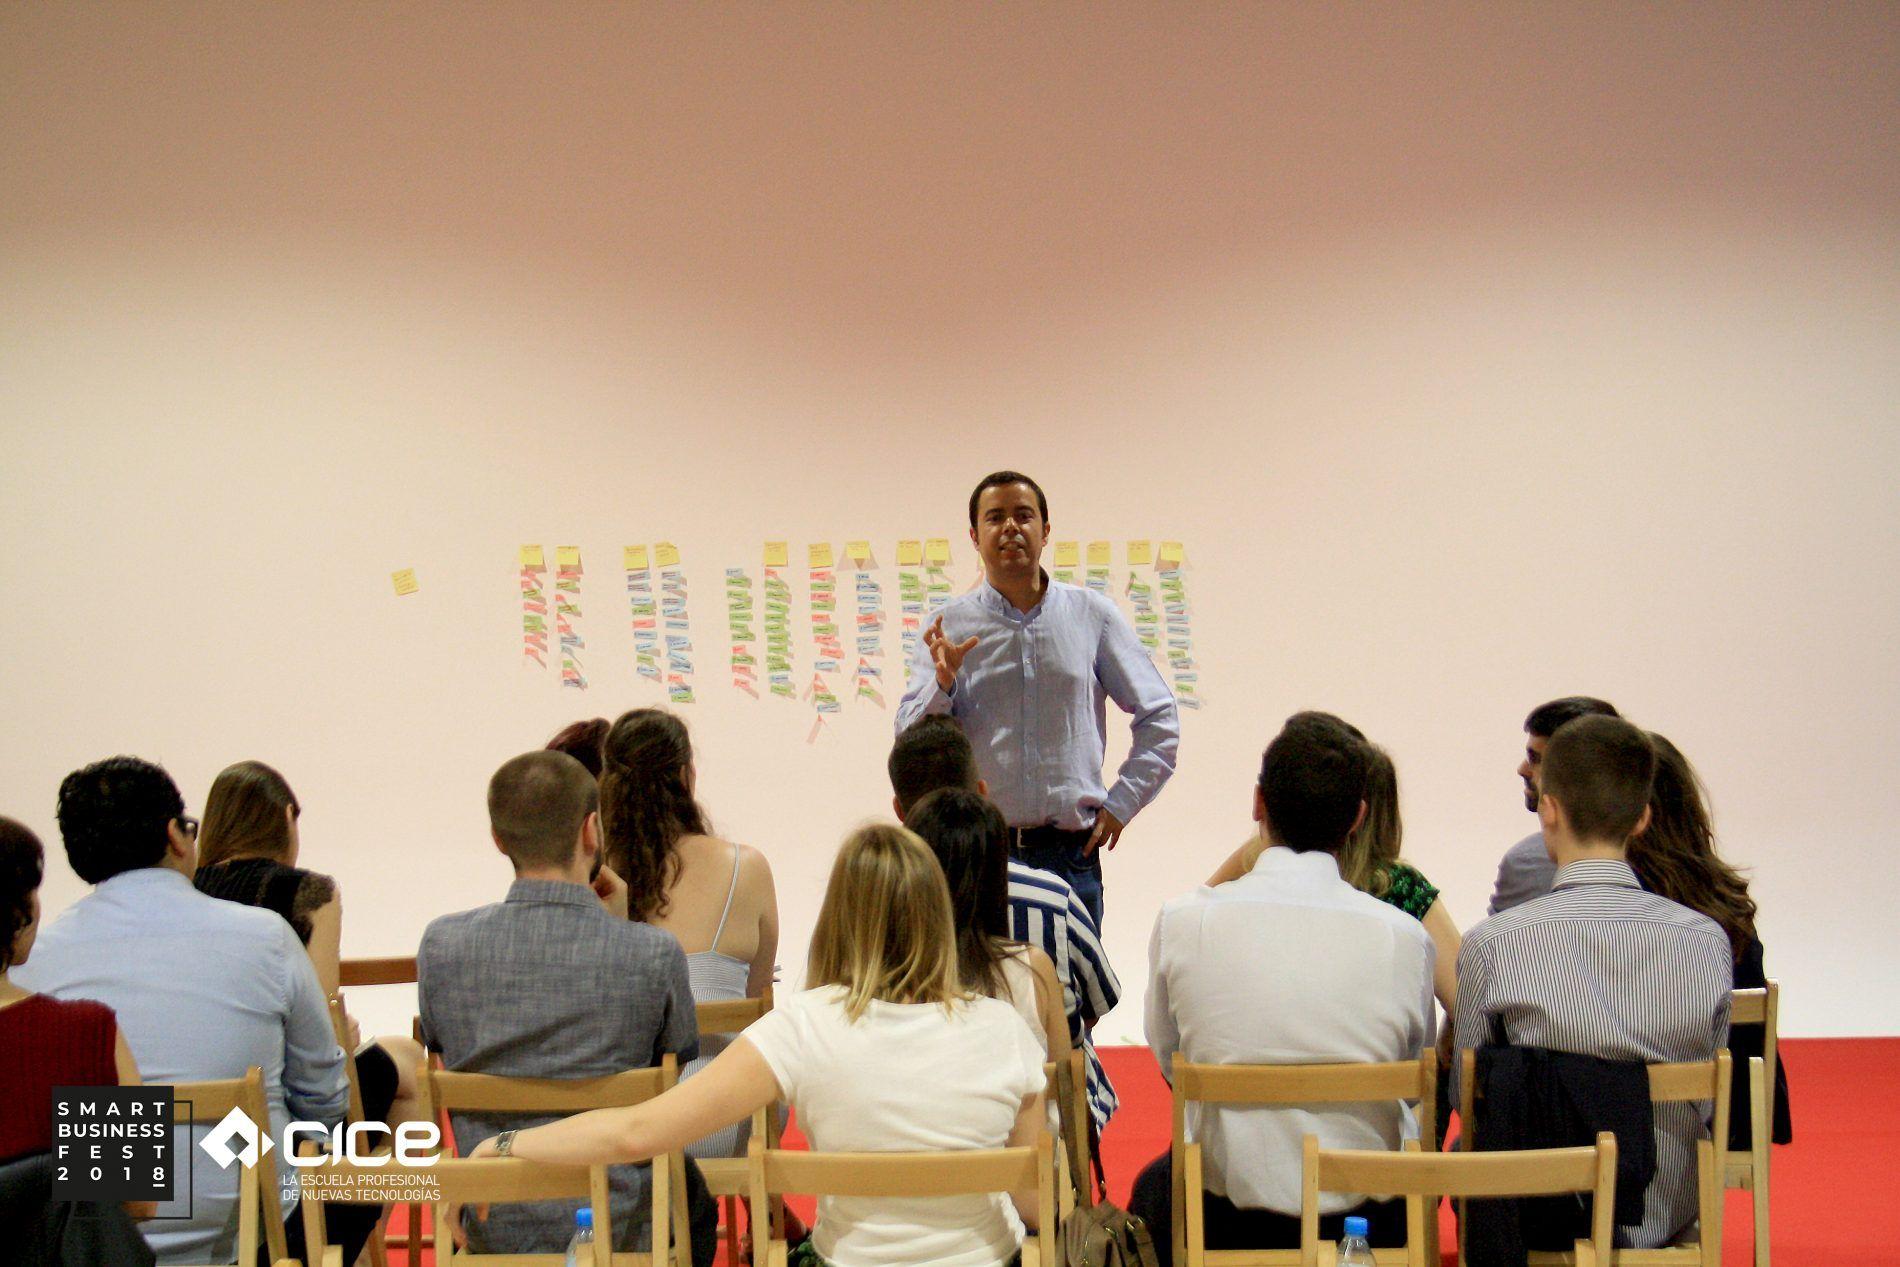 smart business fest - media partner oficial blog creatividad en blanco